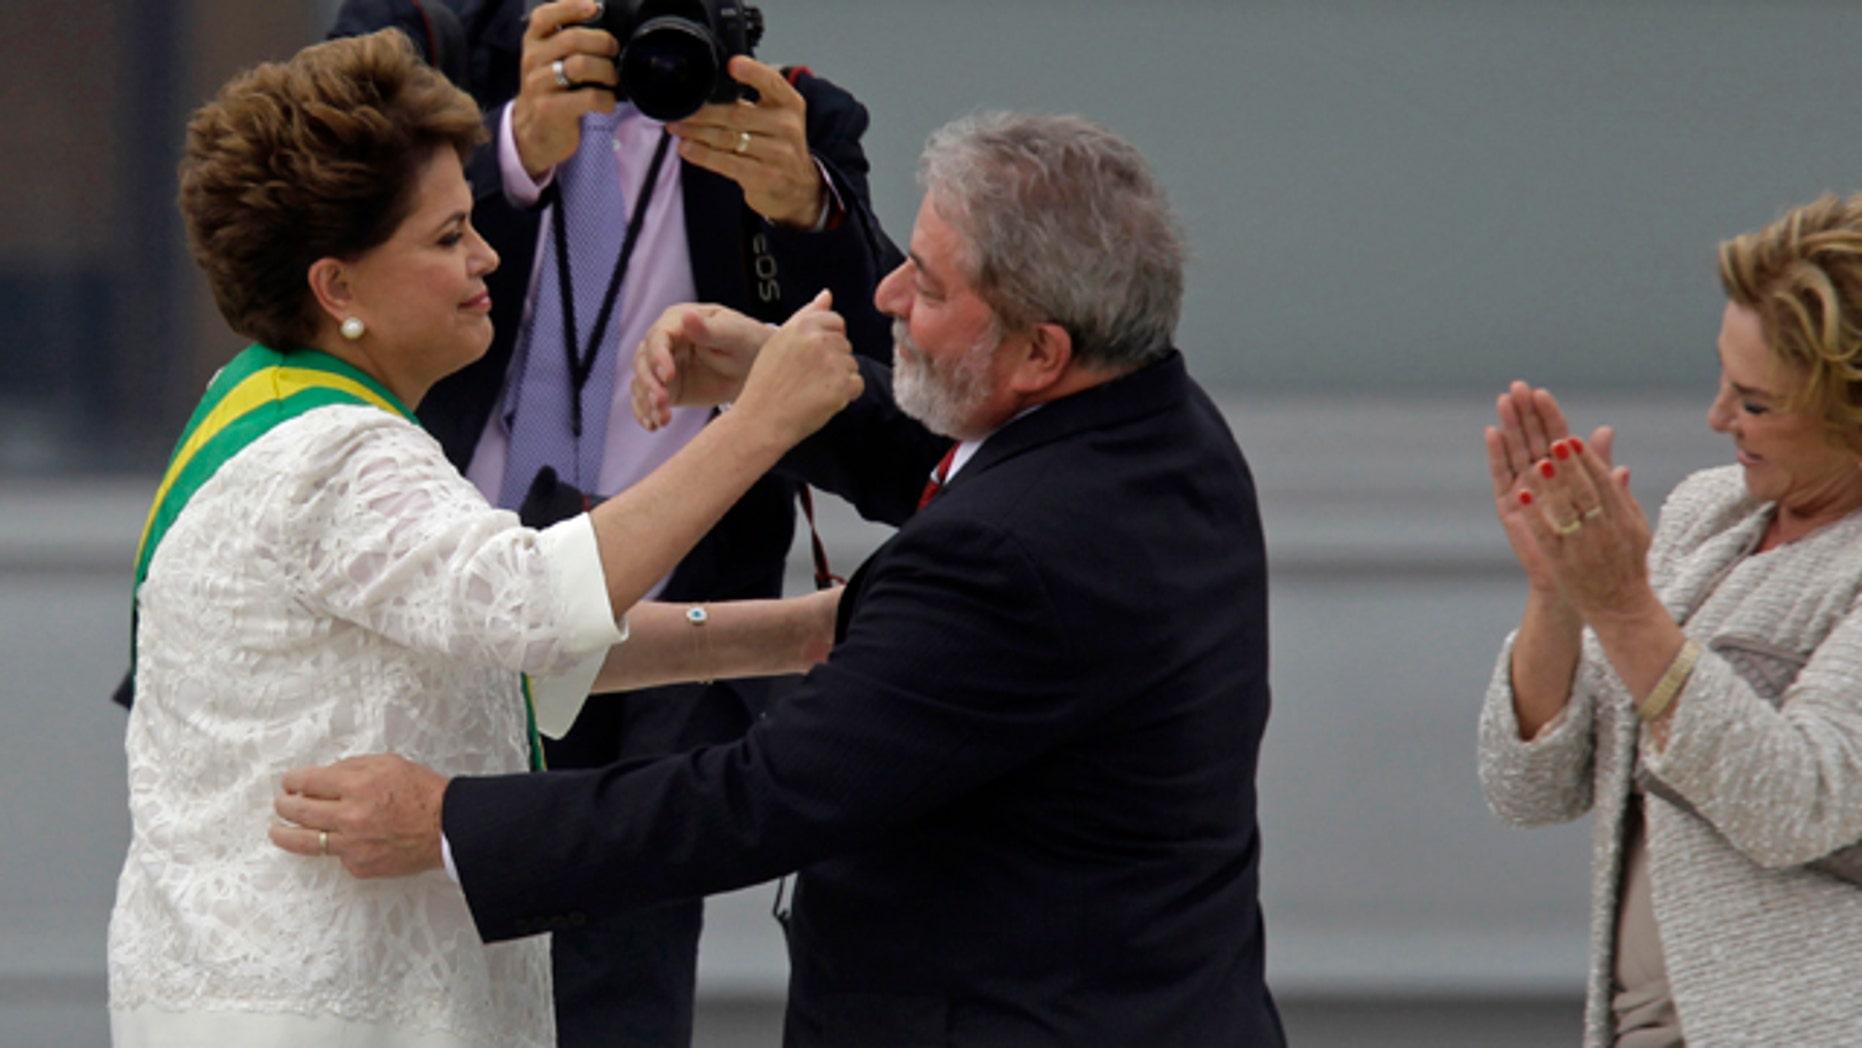 Jan. 1, 2011: Brazil´s outgoing President Luiz Inacio Lula da Silva embraces Brazil's President Dilma Rousseff after placing the presidential sash on her at the Planalto palace in Brasilia, Brazil